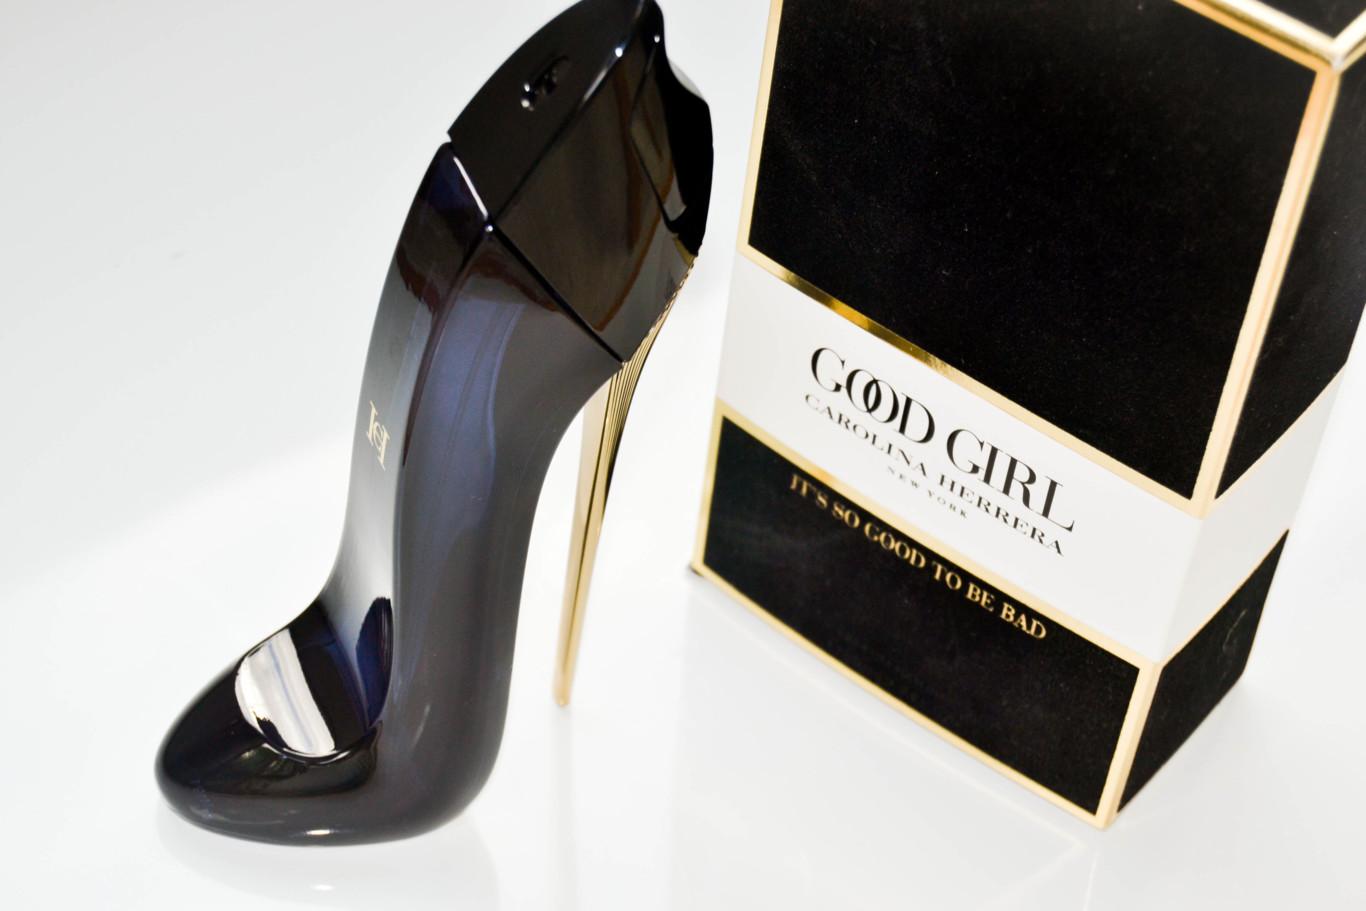 Probamos Good Girl de Carolina Herrera, un perfume de vértigo que no te  dejará indiferente f4d0a39956